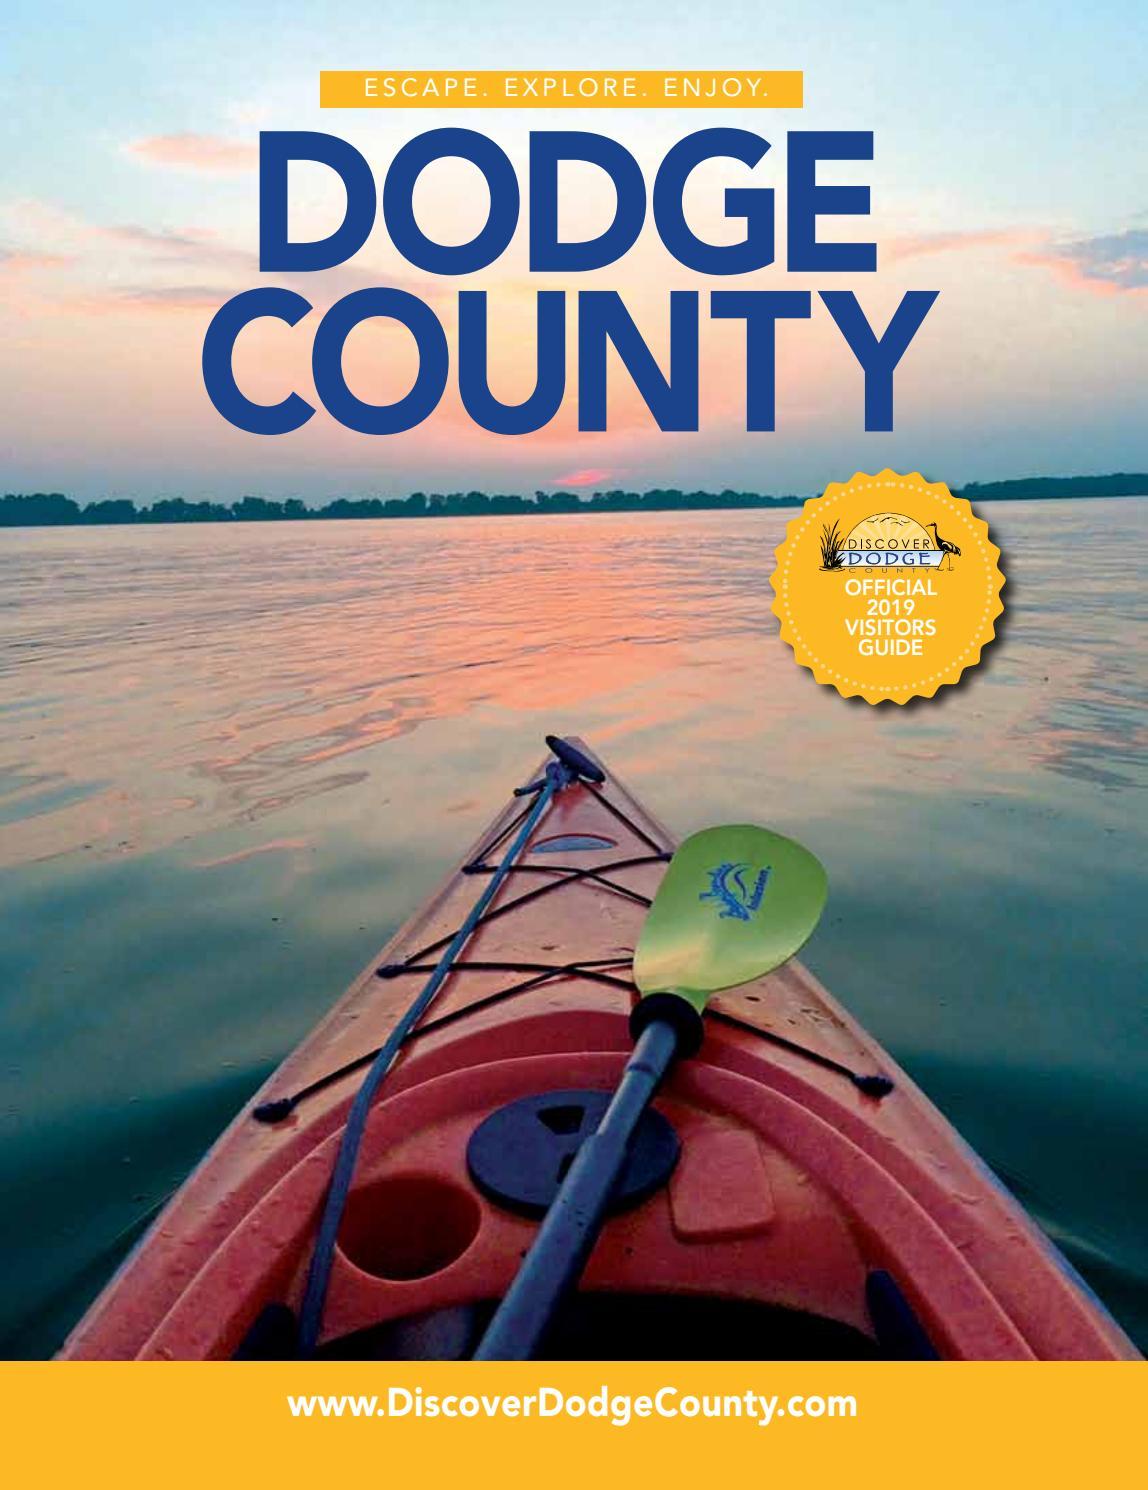 Dodge County Fair Nebraska 2020.Dodge County Visitors Guide 2019 By Madison Com Issuu